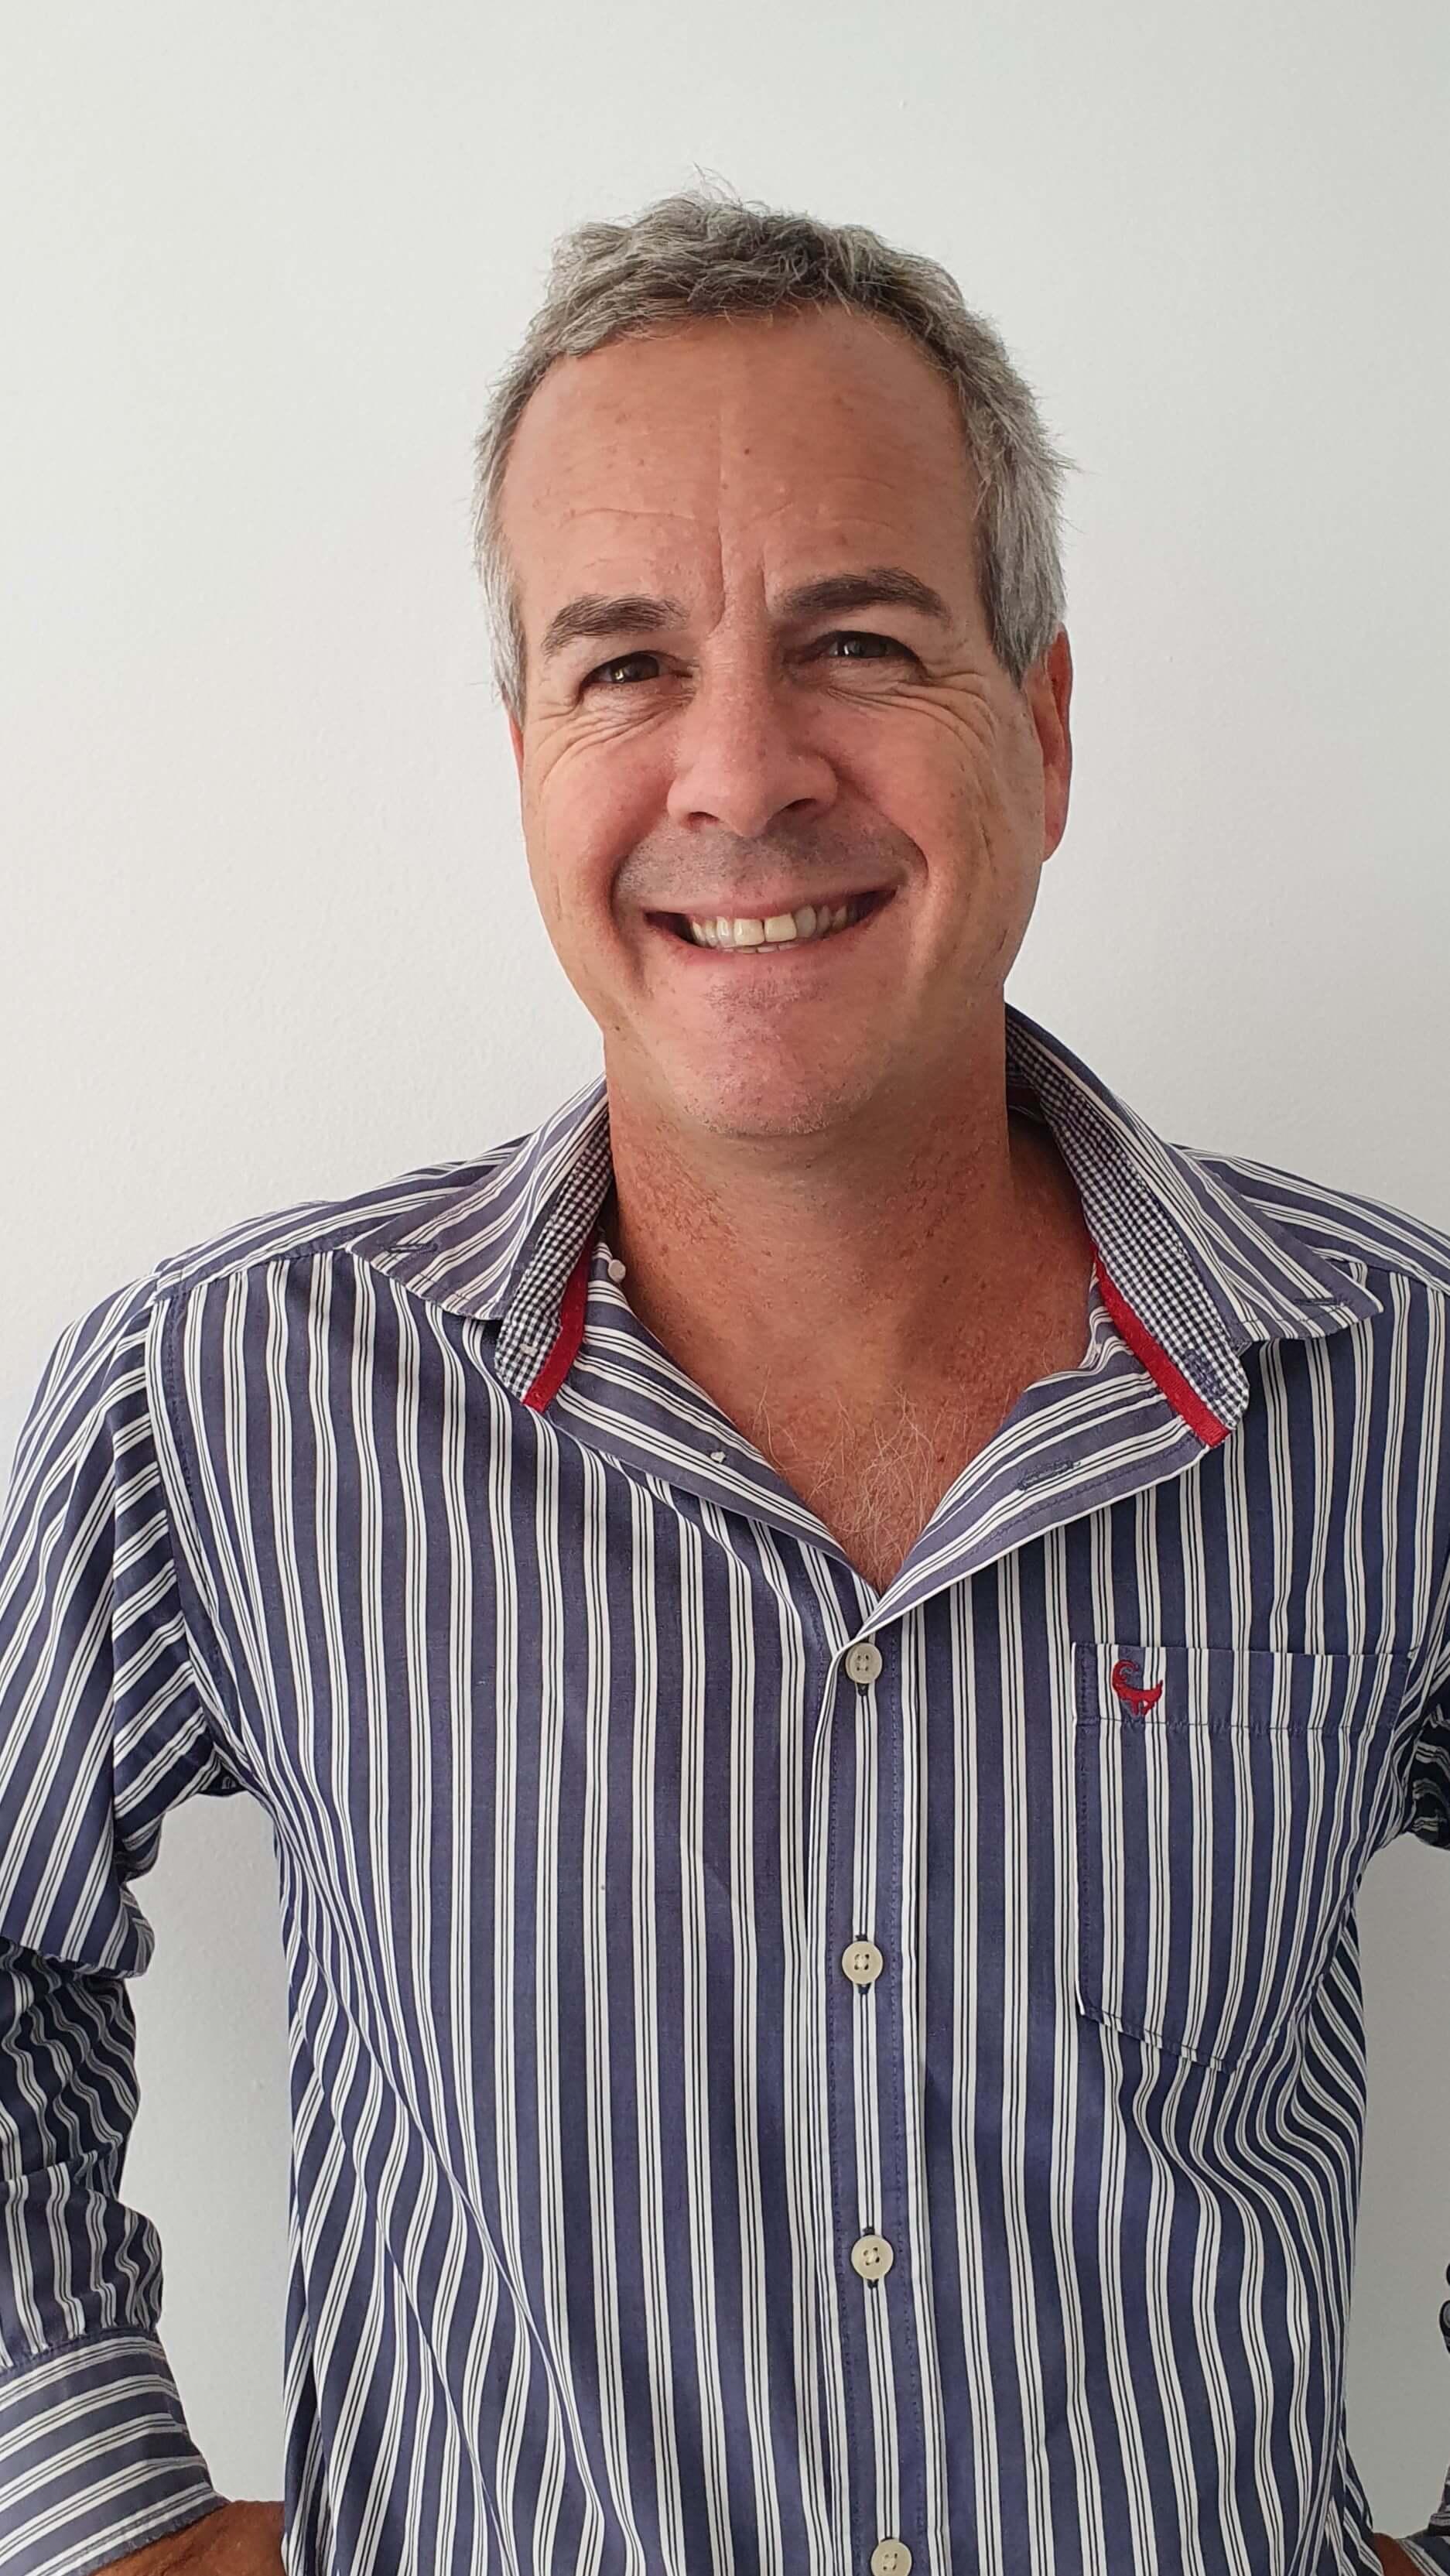 Trainer Dr. Philip Olivier